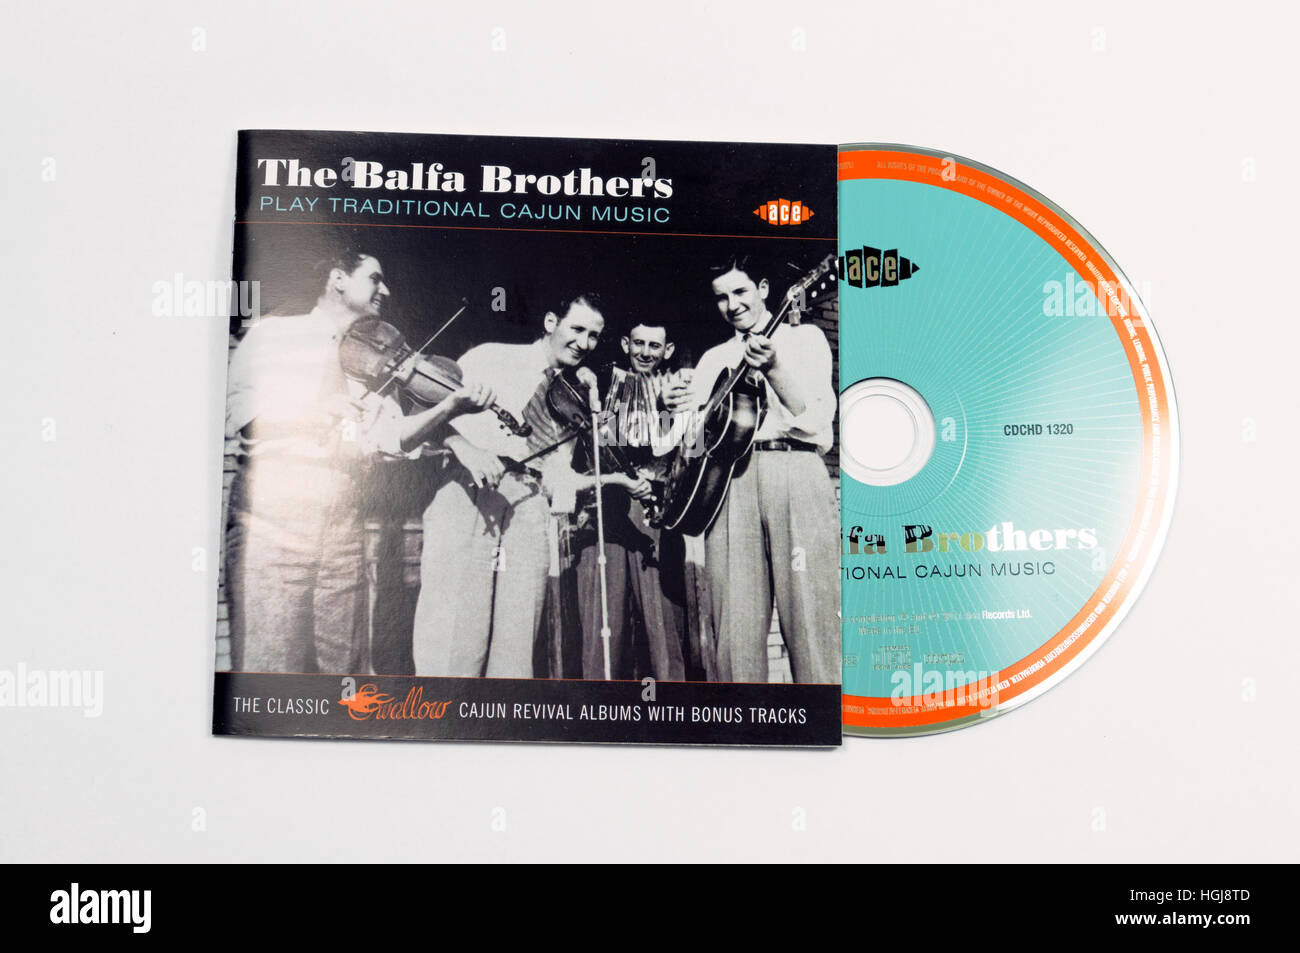 "The Balfa Brothers ""Play traditional Cajun music"" album Stock Photo"